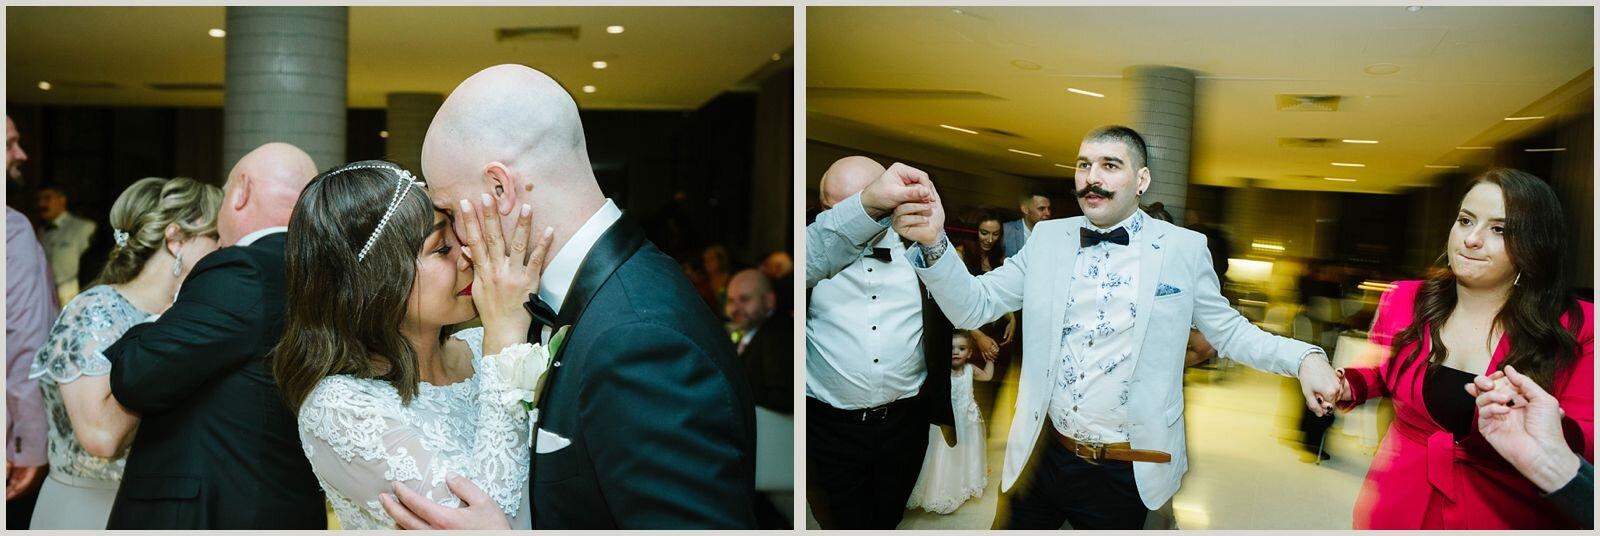 joseph_koprek_wedding_melbourne_the_prince_deck_0098.jpg